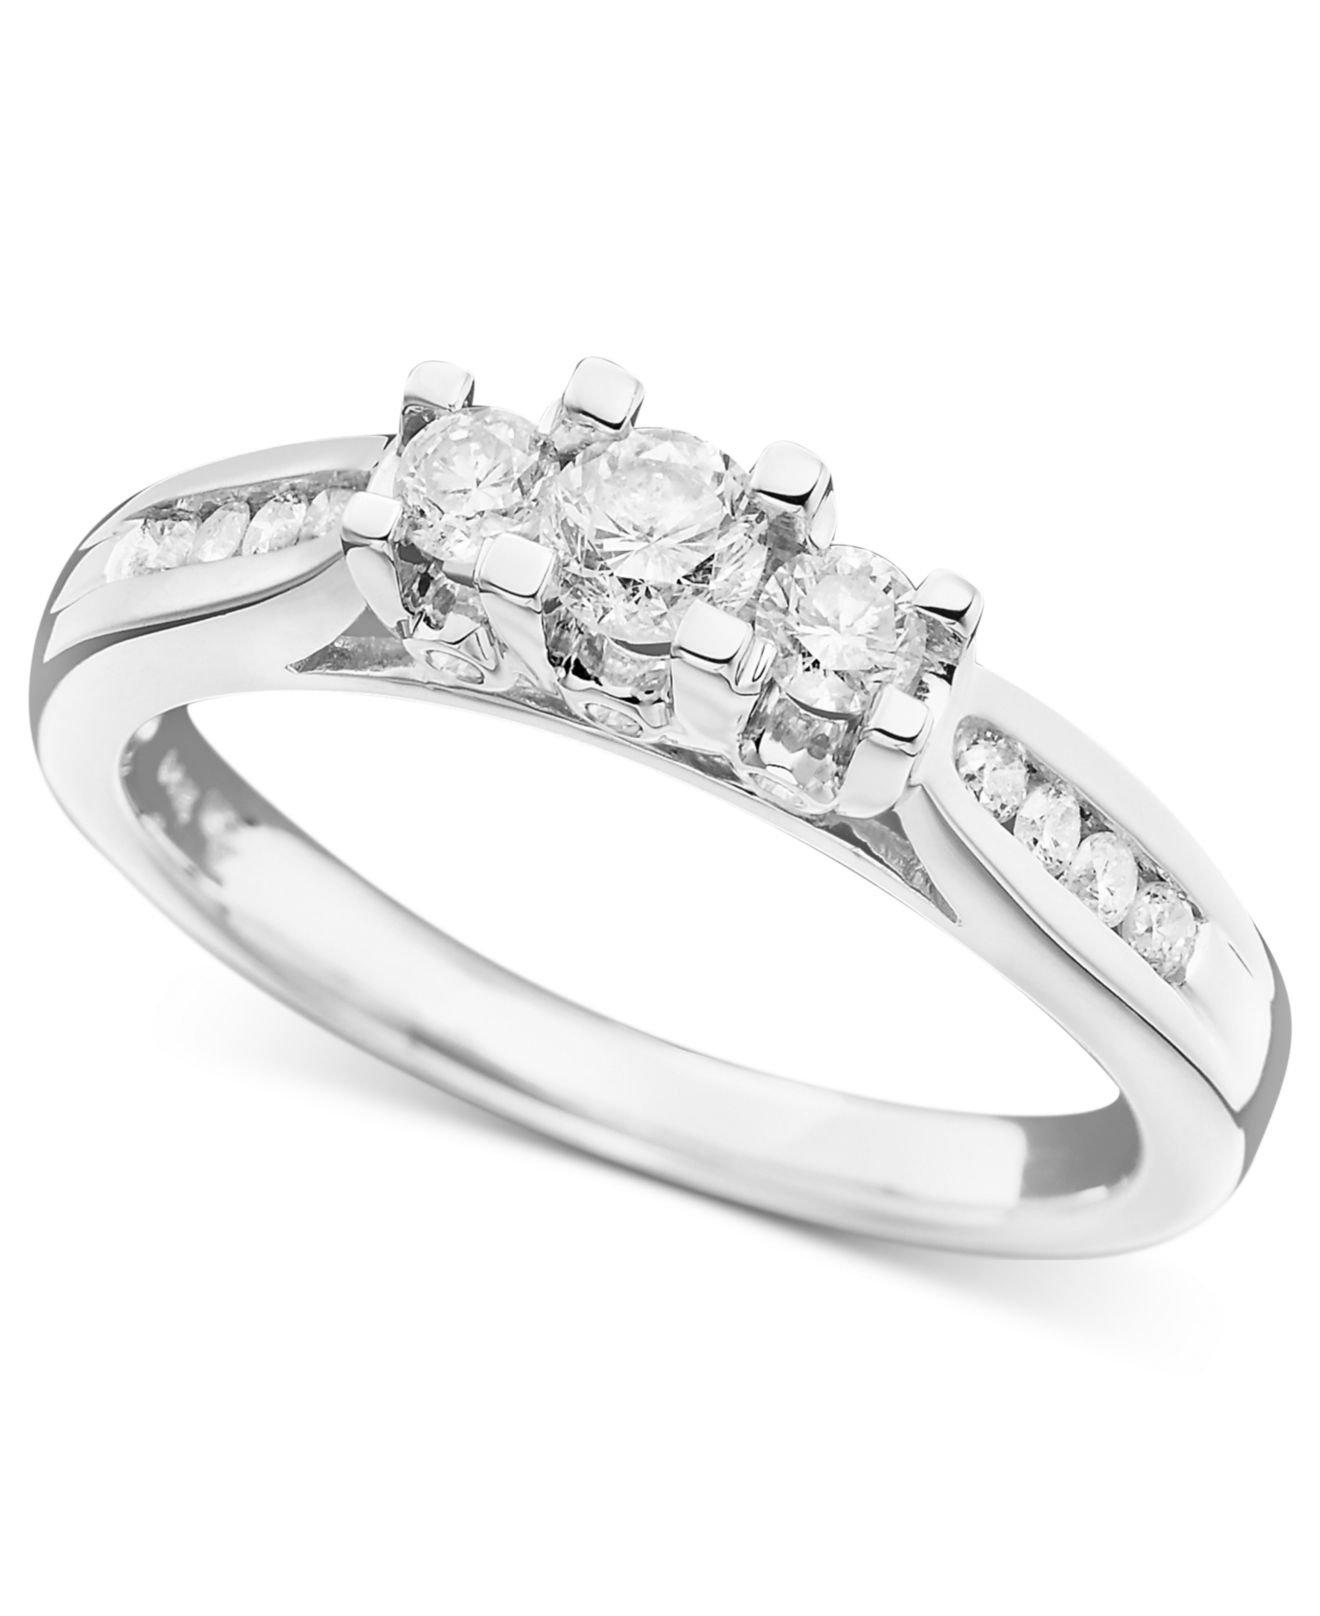 Macy S Diamond Rings On Sale